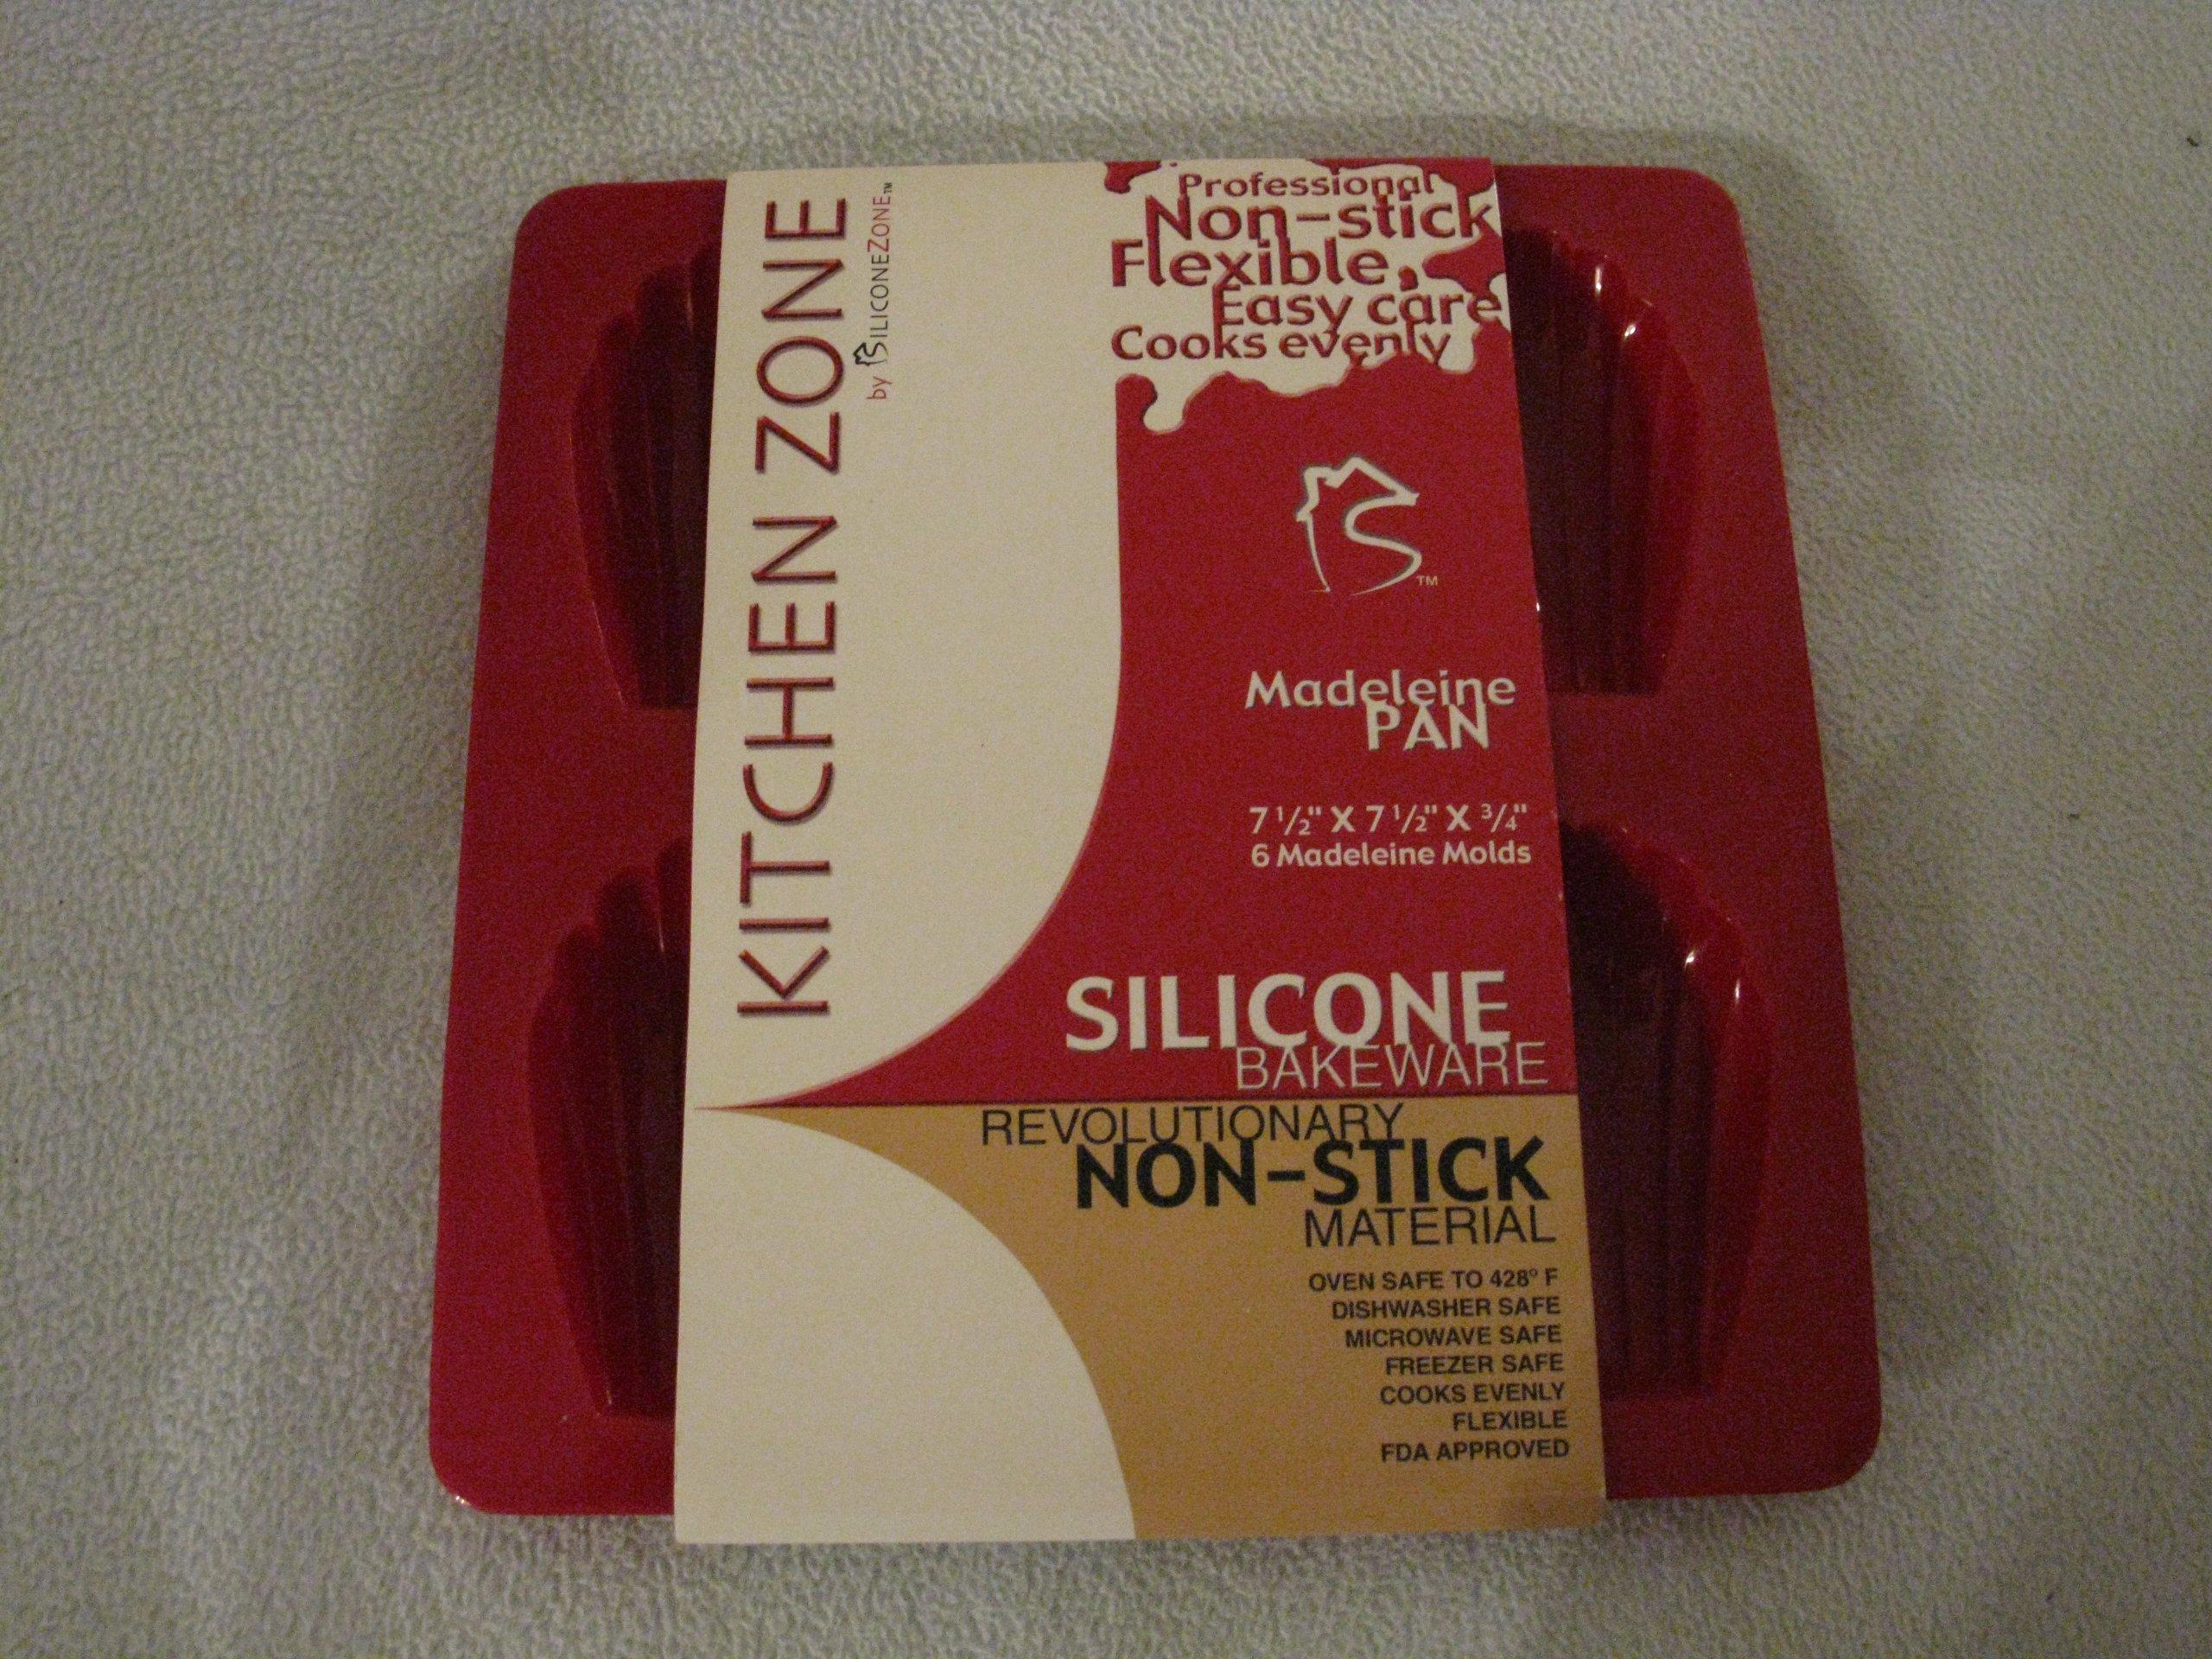 SiliconeZone 6-cavity Madeleine Pan, Red